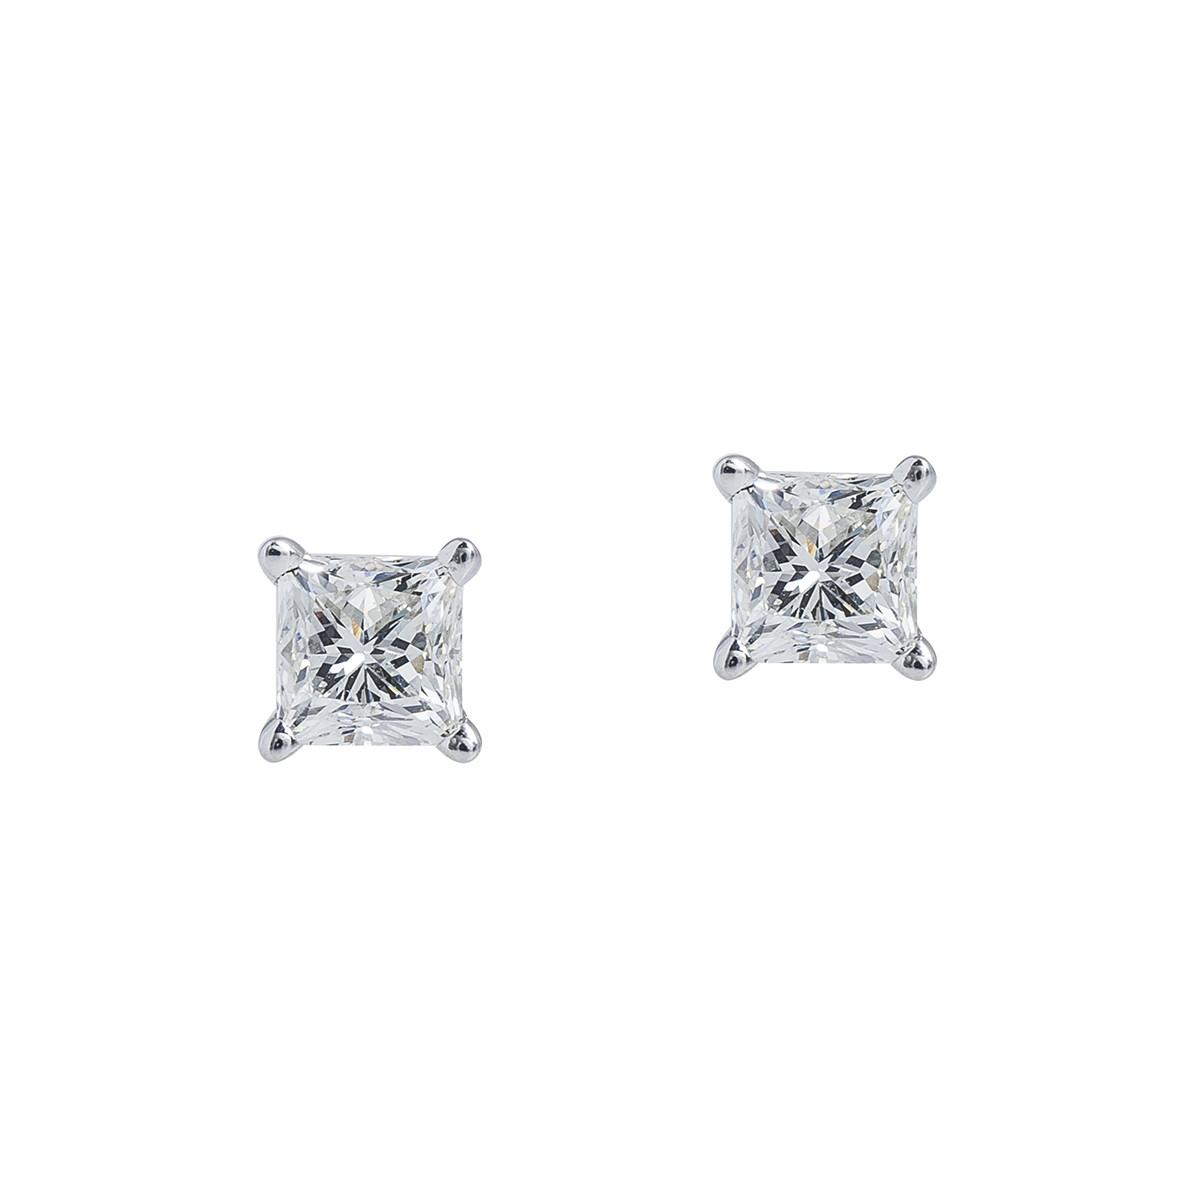 New 1.00 CTW Diamond Stud Earrings